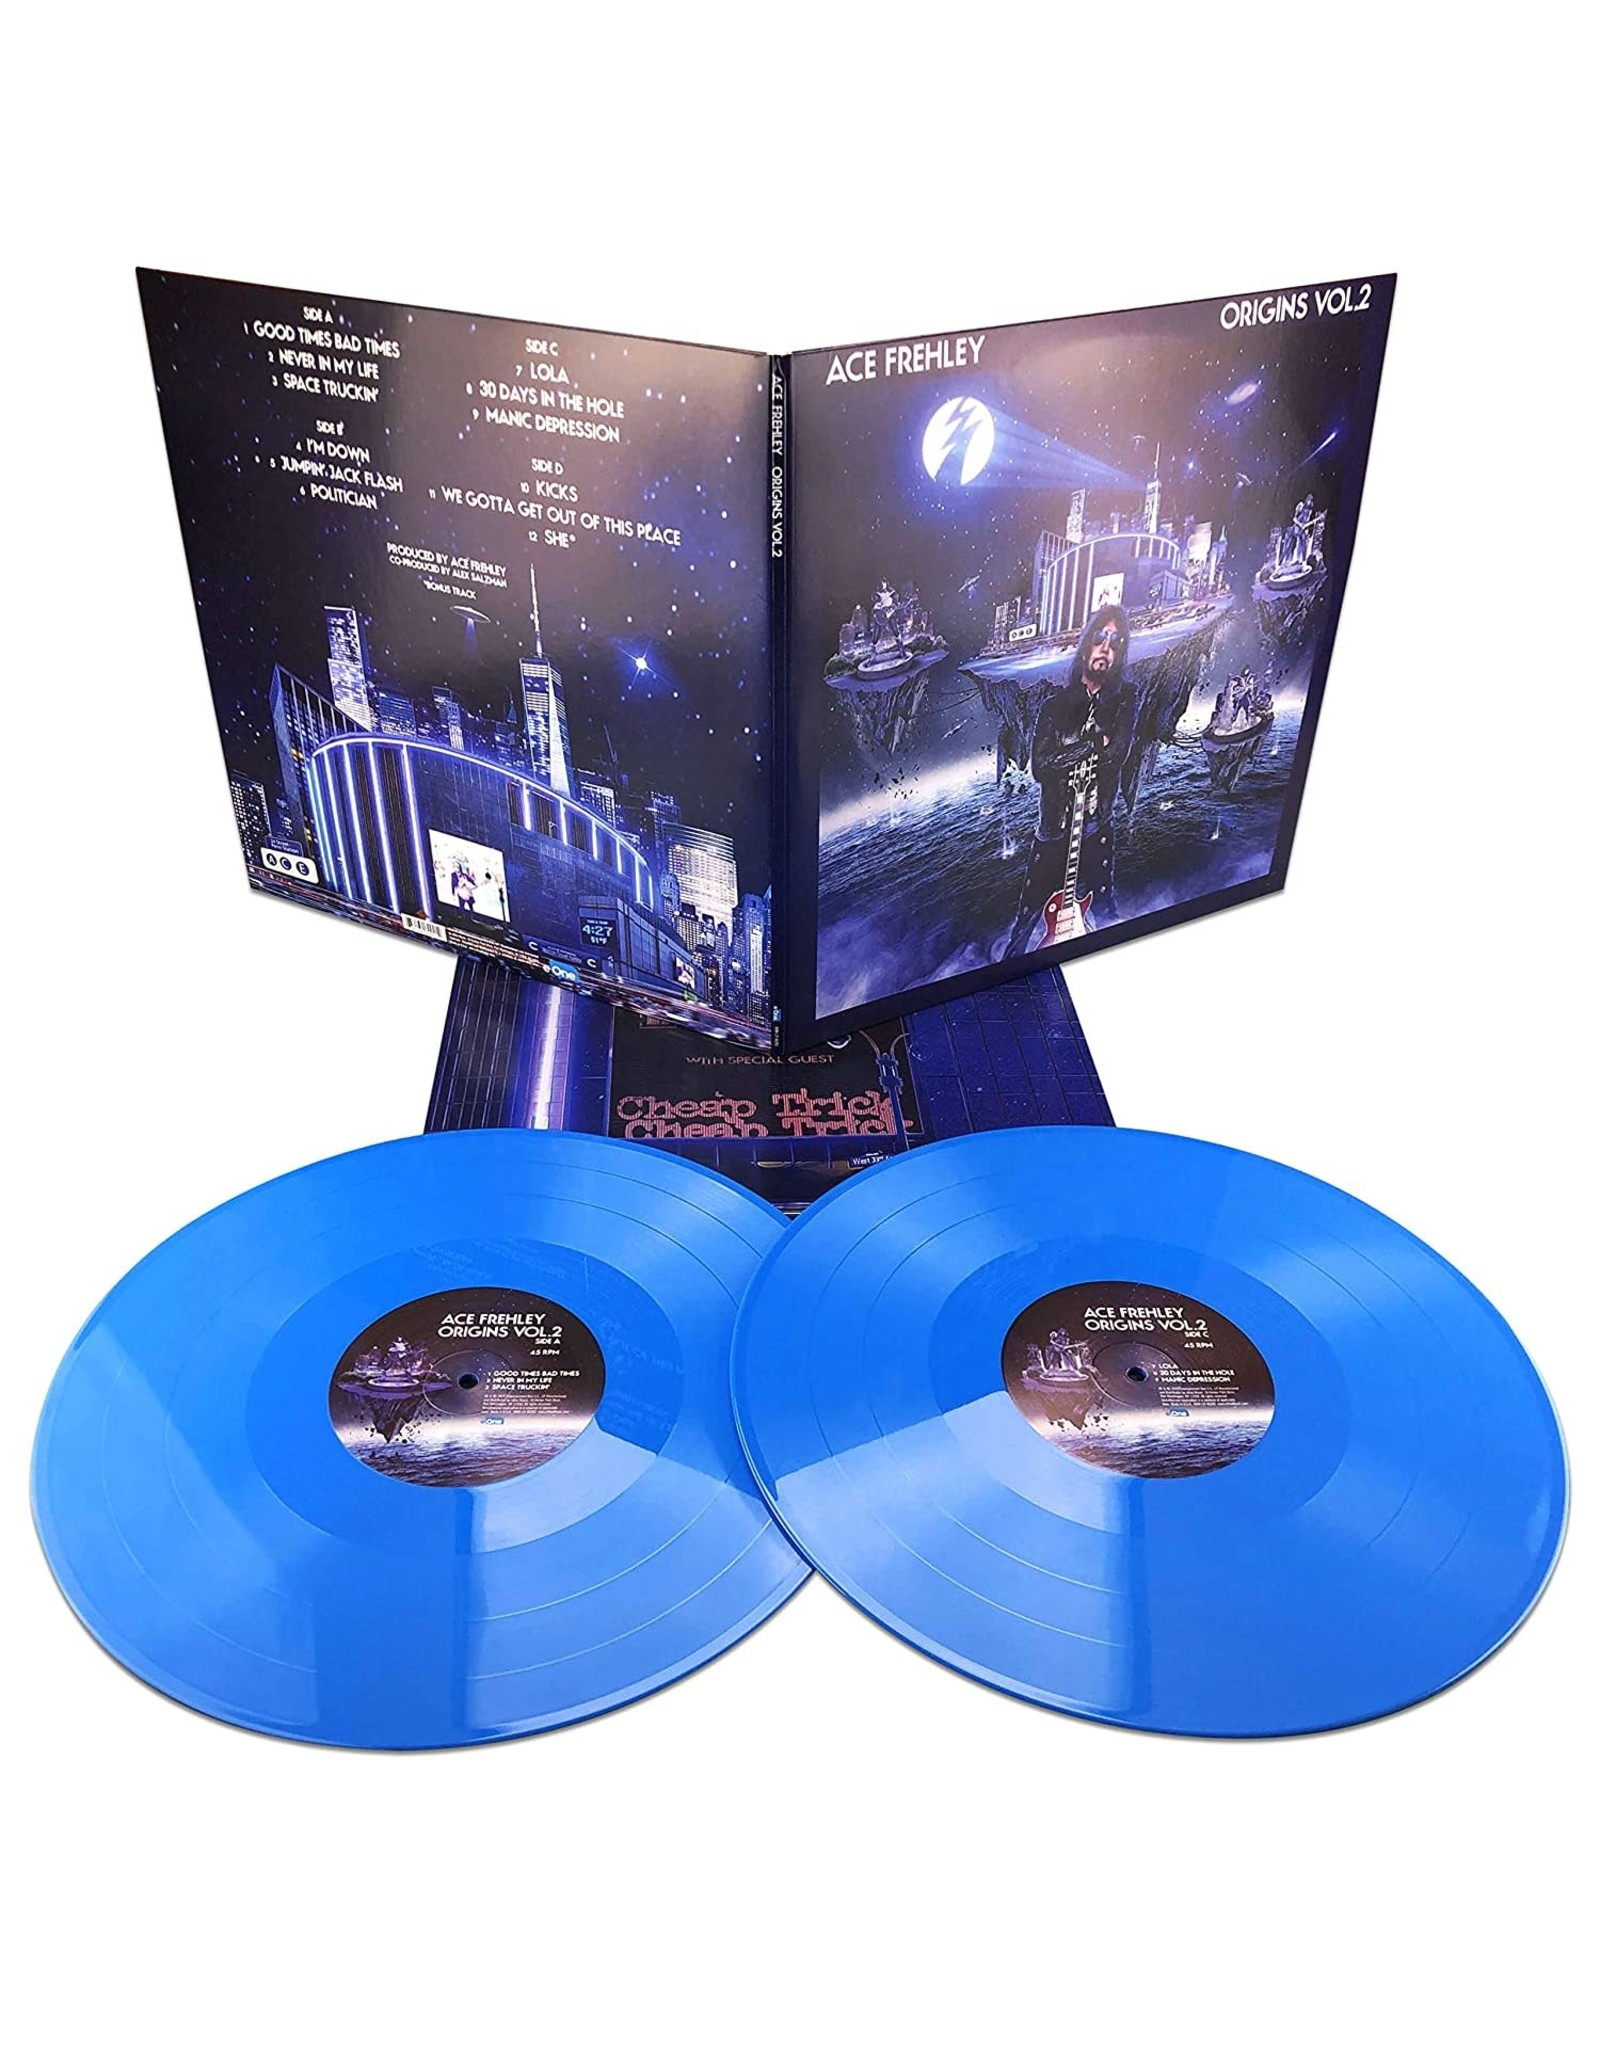 Ace Frehley - Origins Vol. 2 (Blue Vinyl)